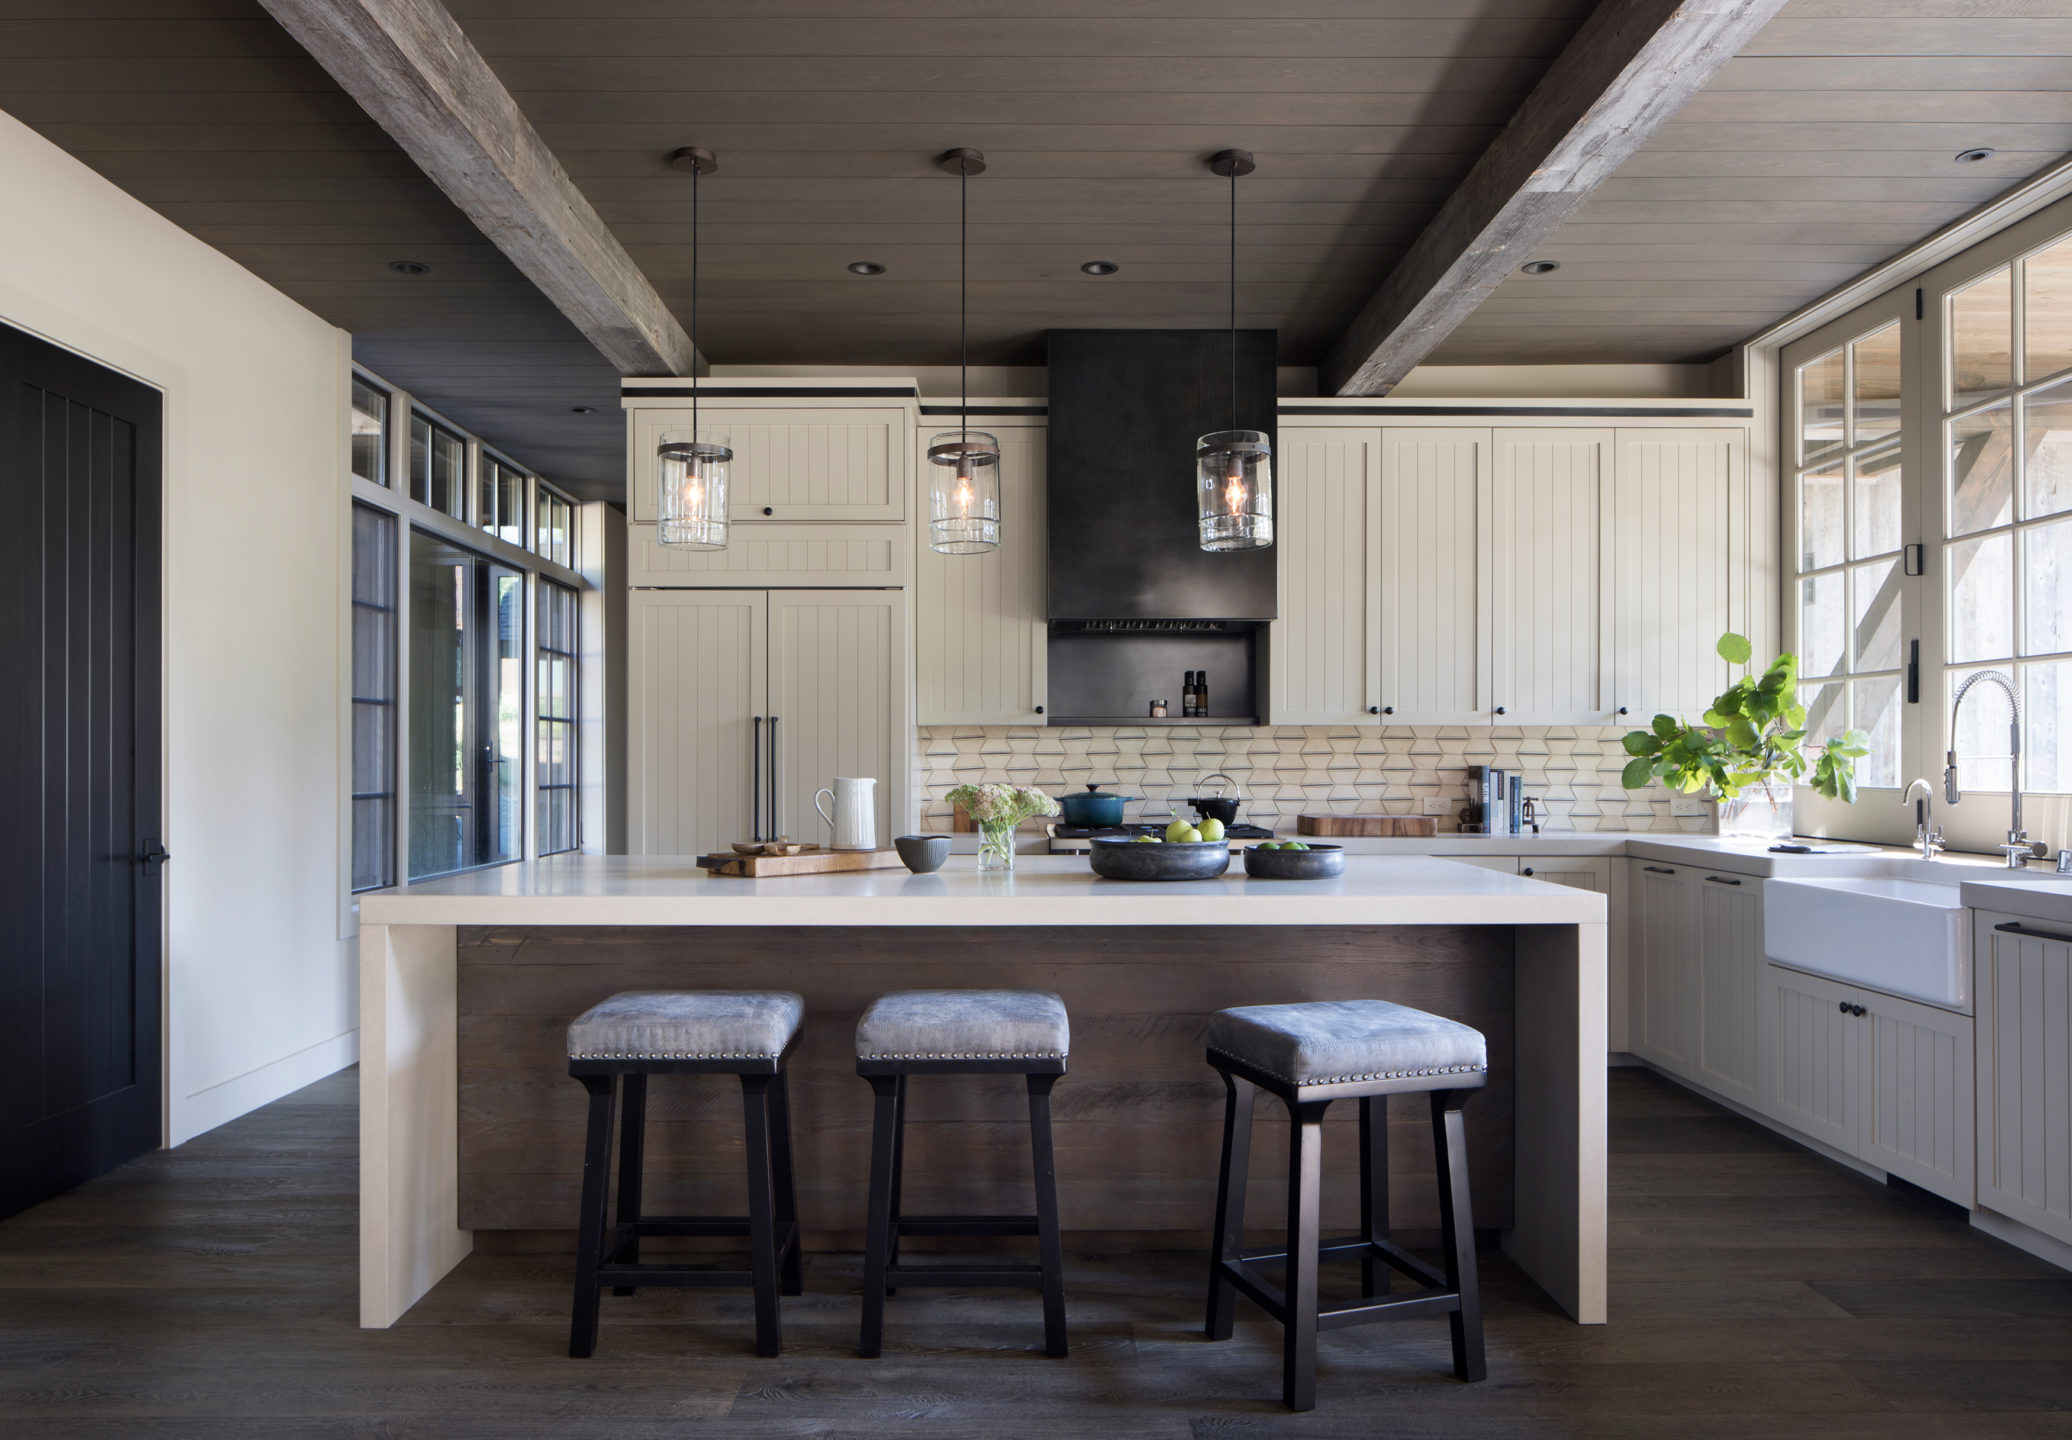 Jennifer_robins_interiors_projects_martis_camp_Del_Grand_01_HR_kitchen_island